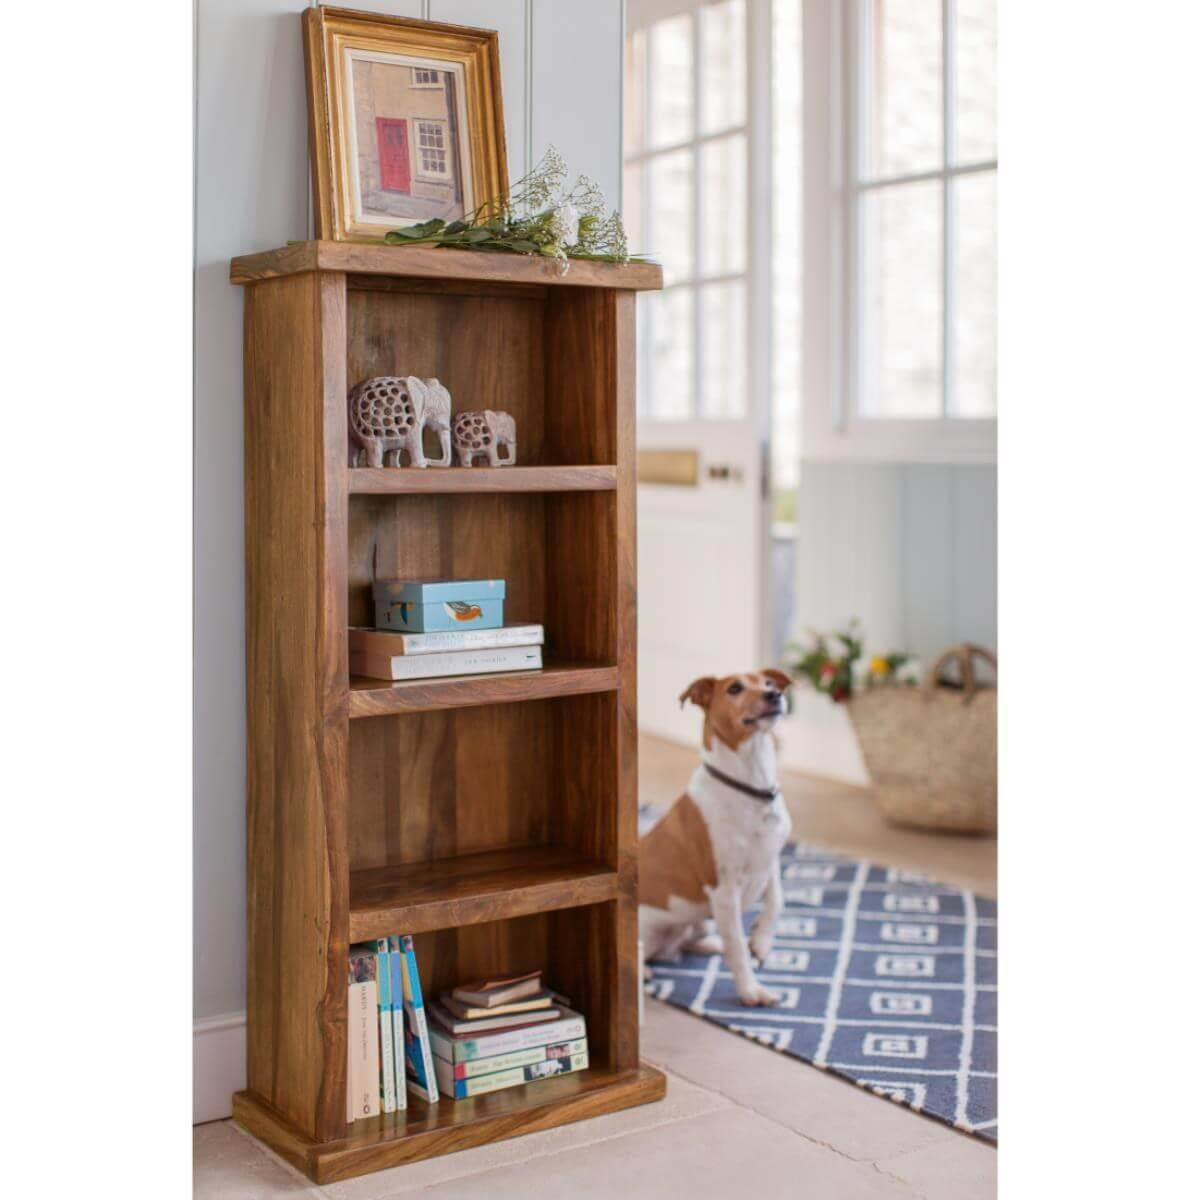 Narrow sheesham bookcase with 3 shelves